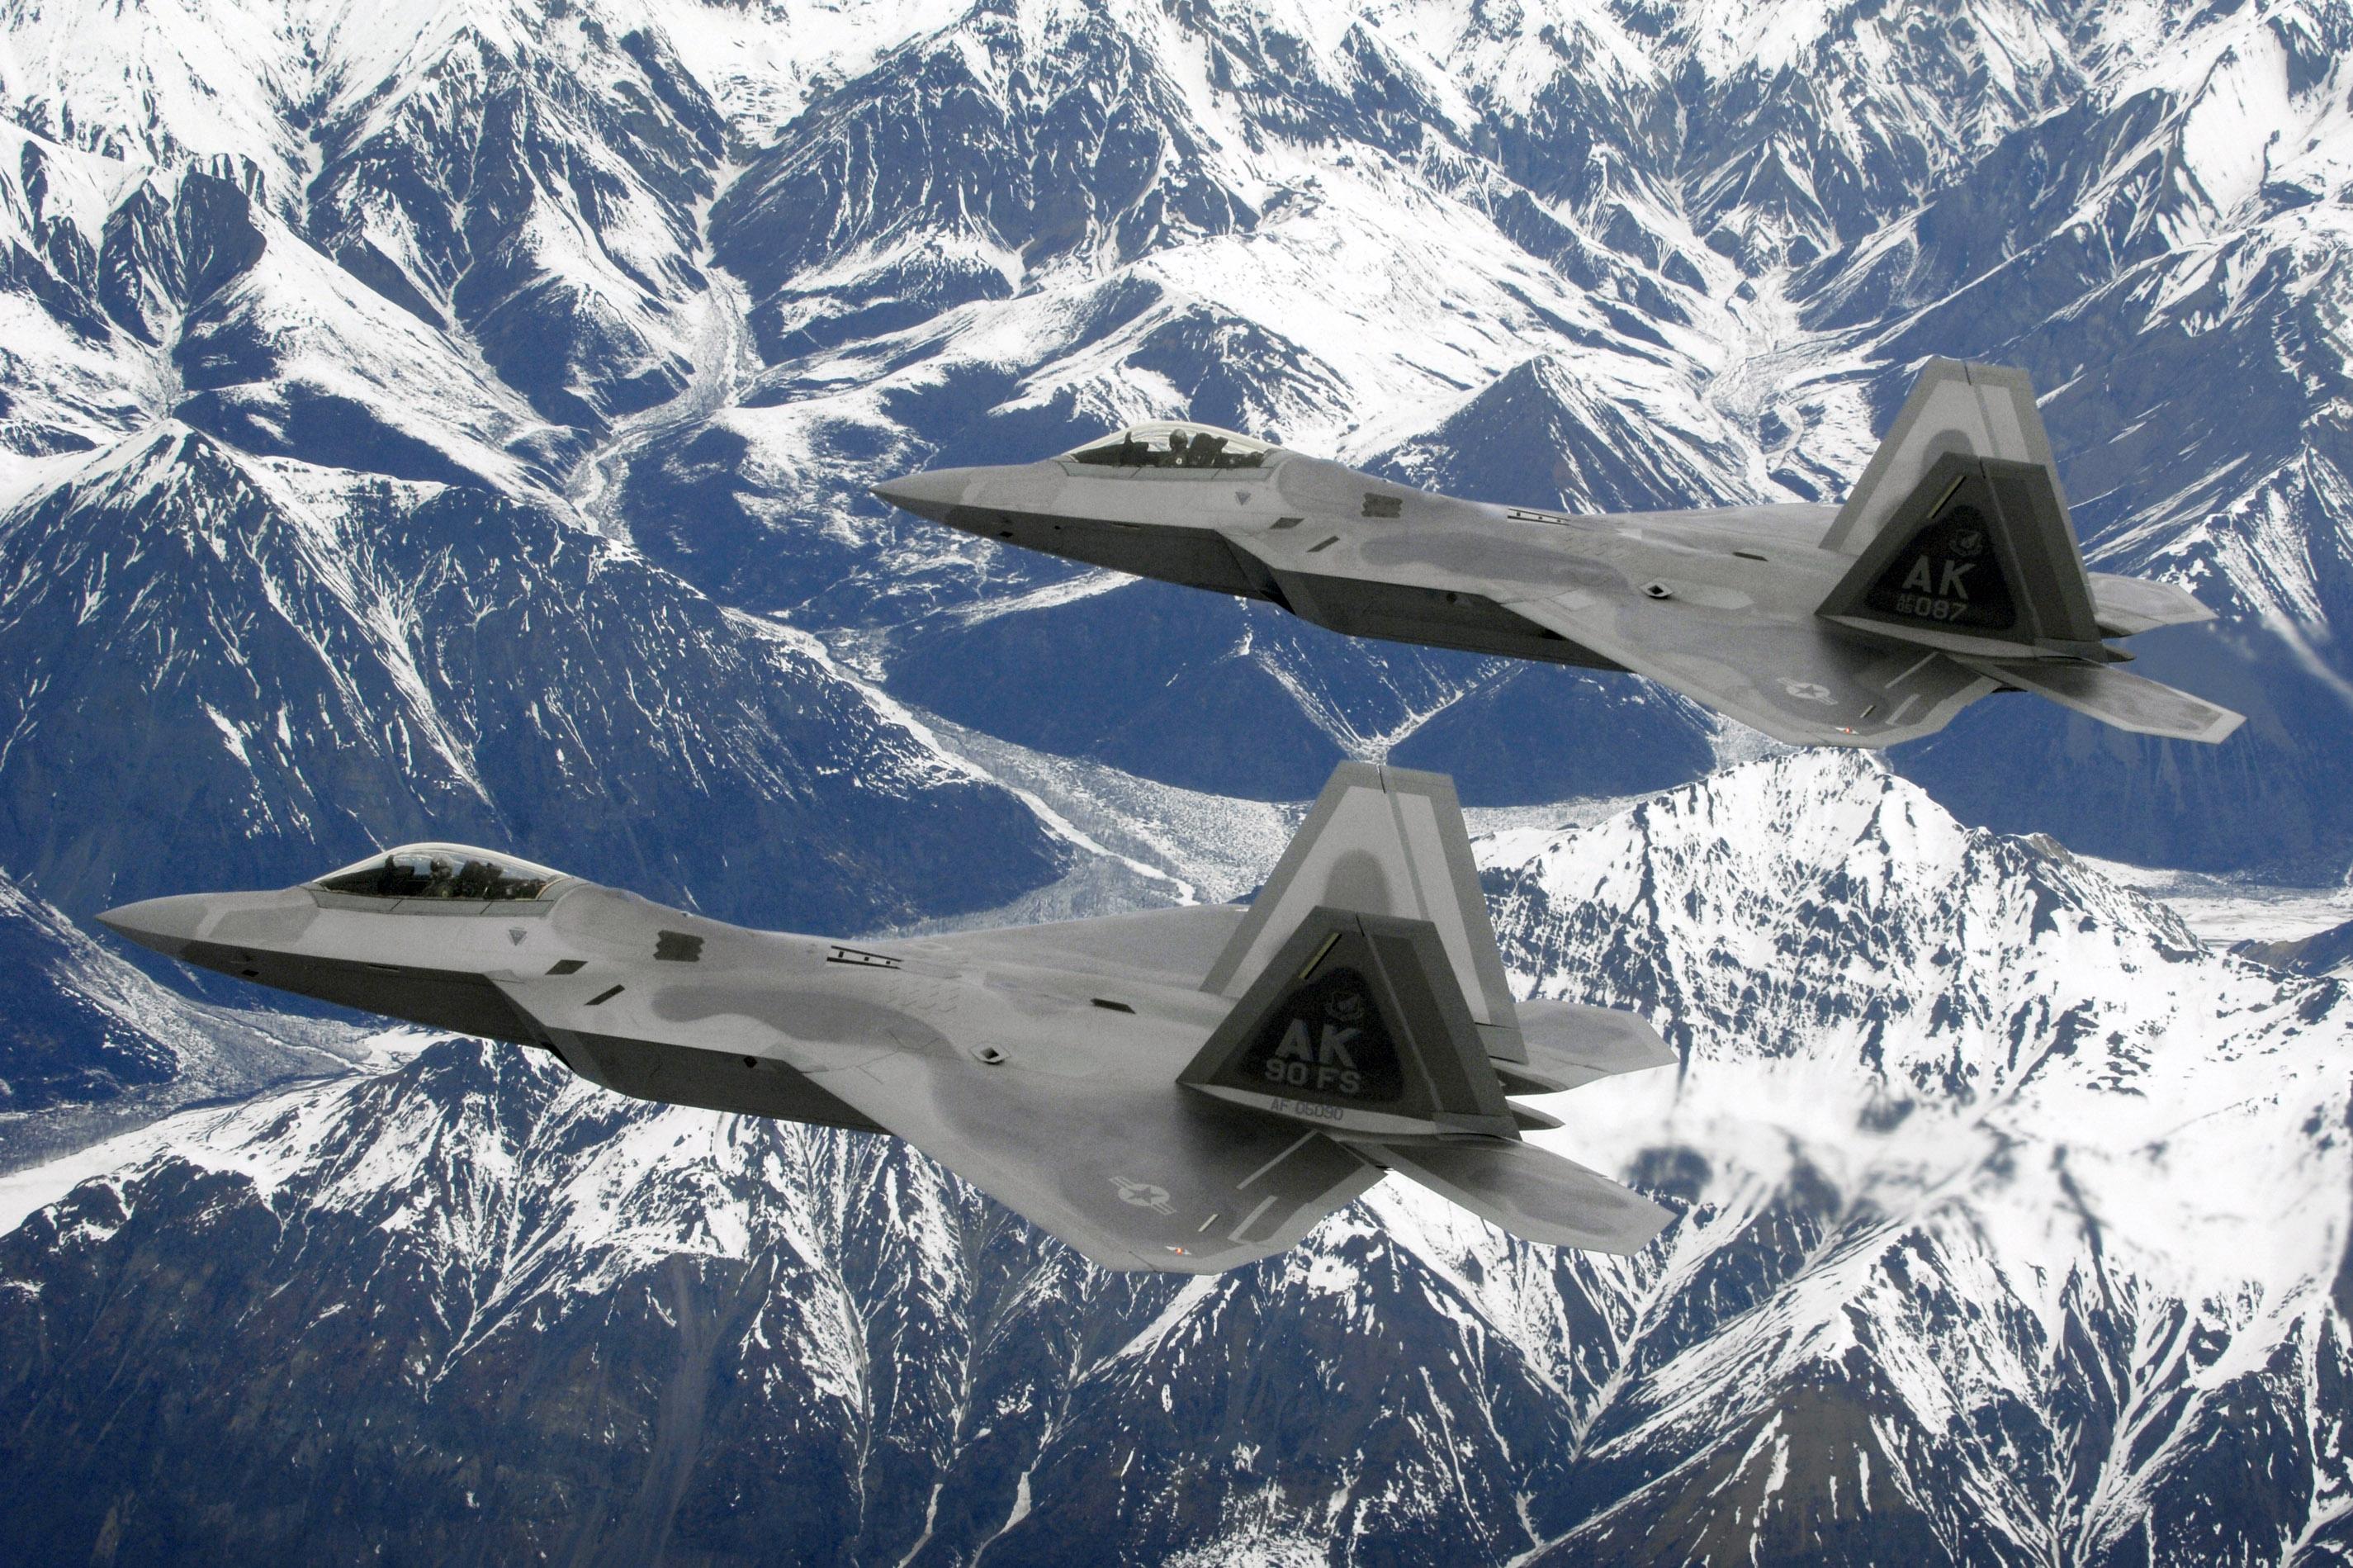 UNITED STATES AIR FORCE JOINT BASE ELMENDORF RICHARDSON ALASKA